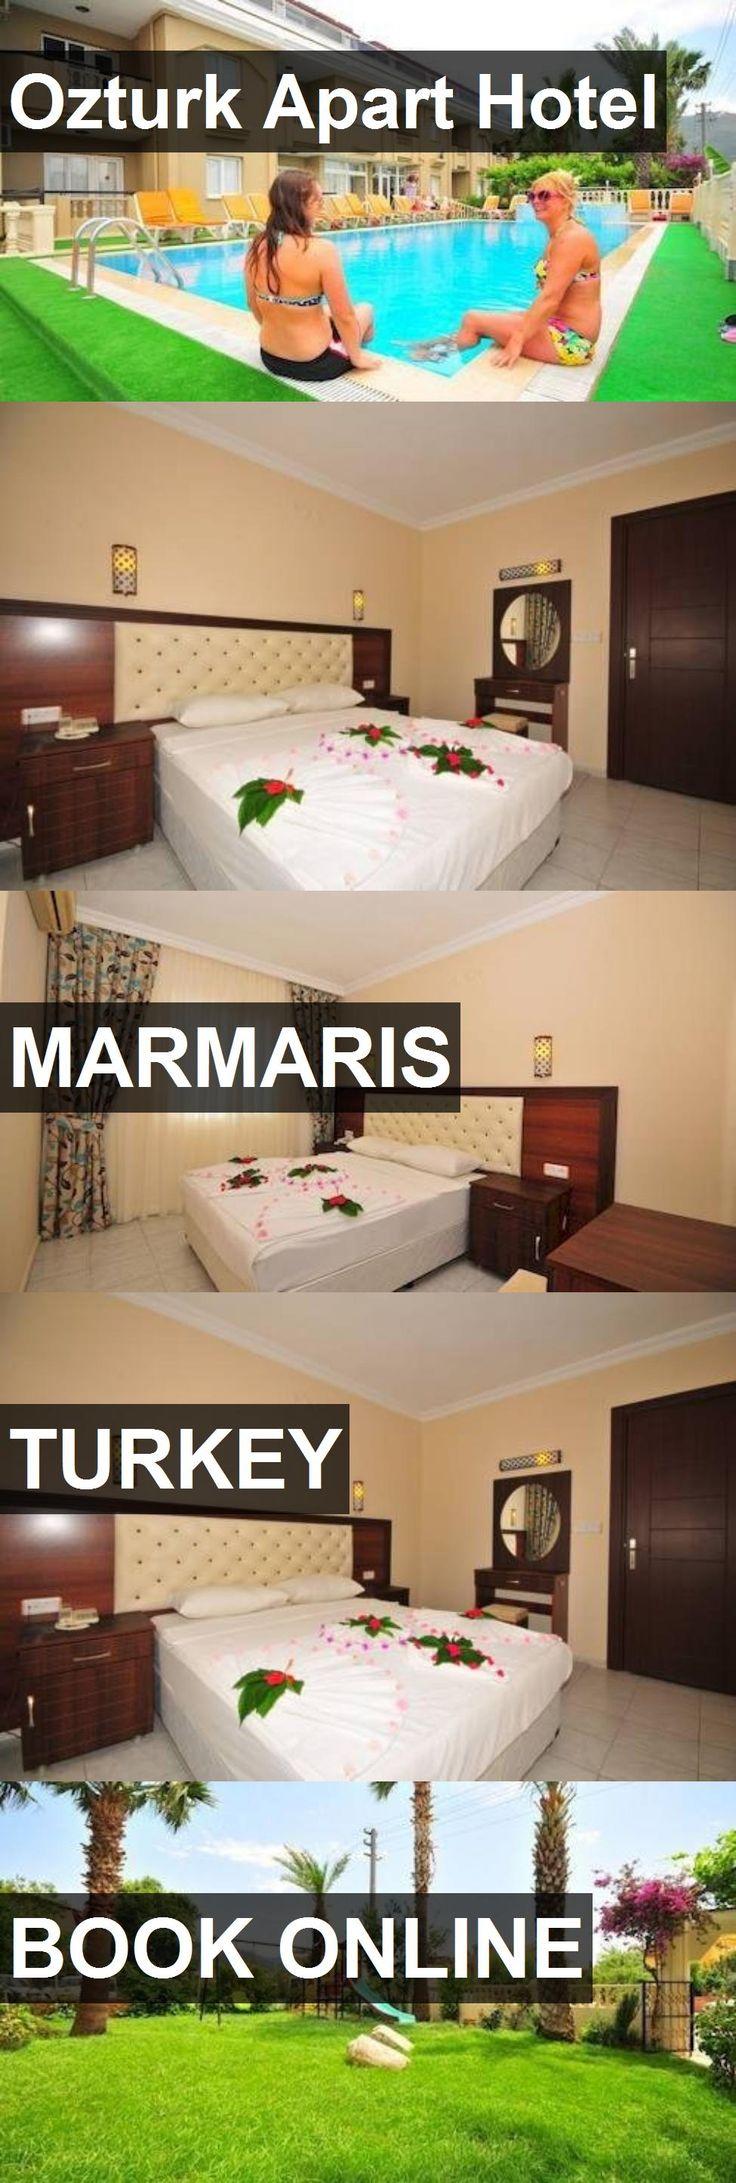 Hotel Ozturk Apart Hotel in Marmaris, Turkey. For more information, photos, reviews and best prices please follow the link. #Turkey #Marmaris #OzturkApartHotel #hotel #travel #vacation